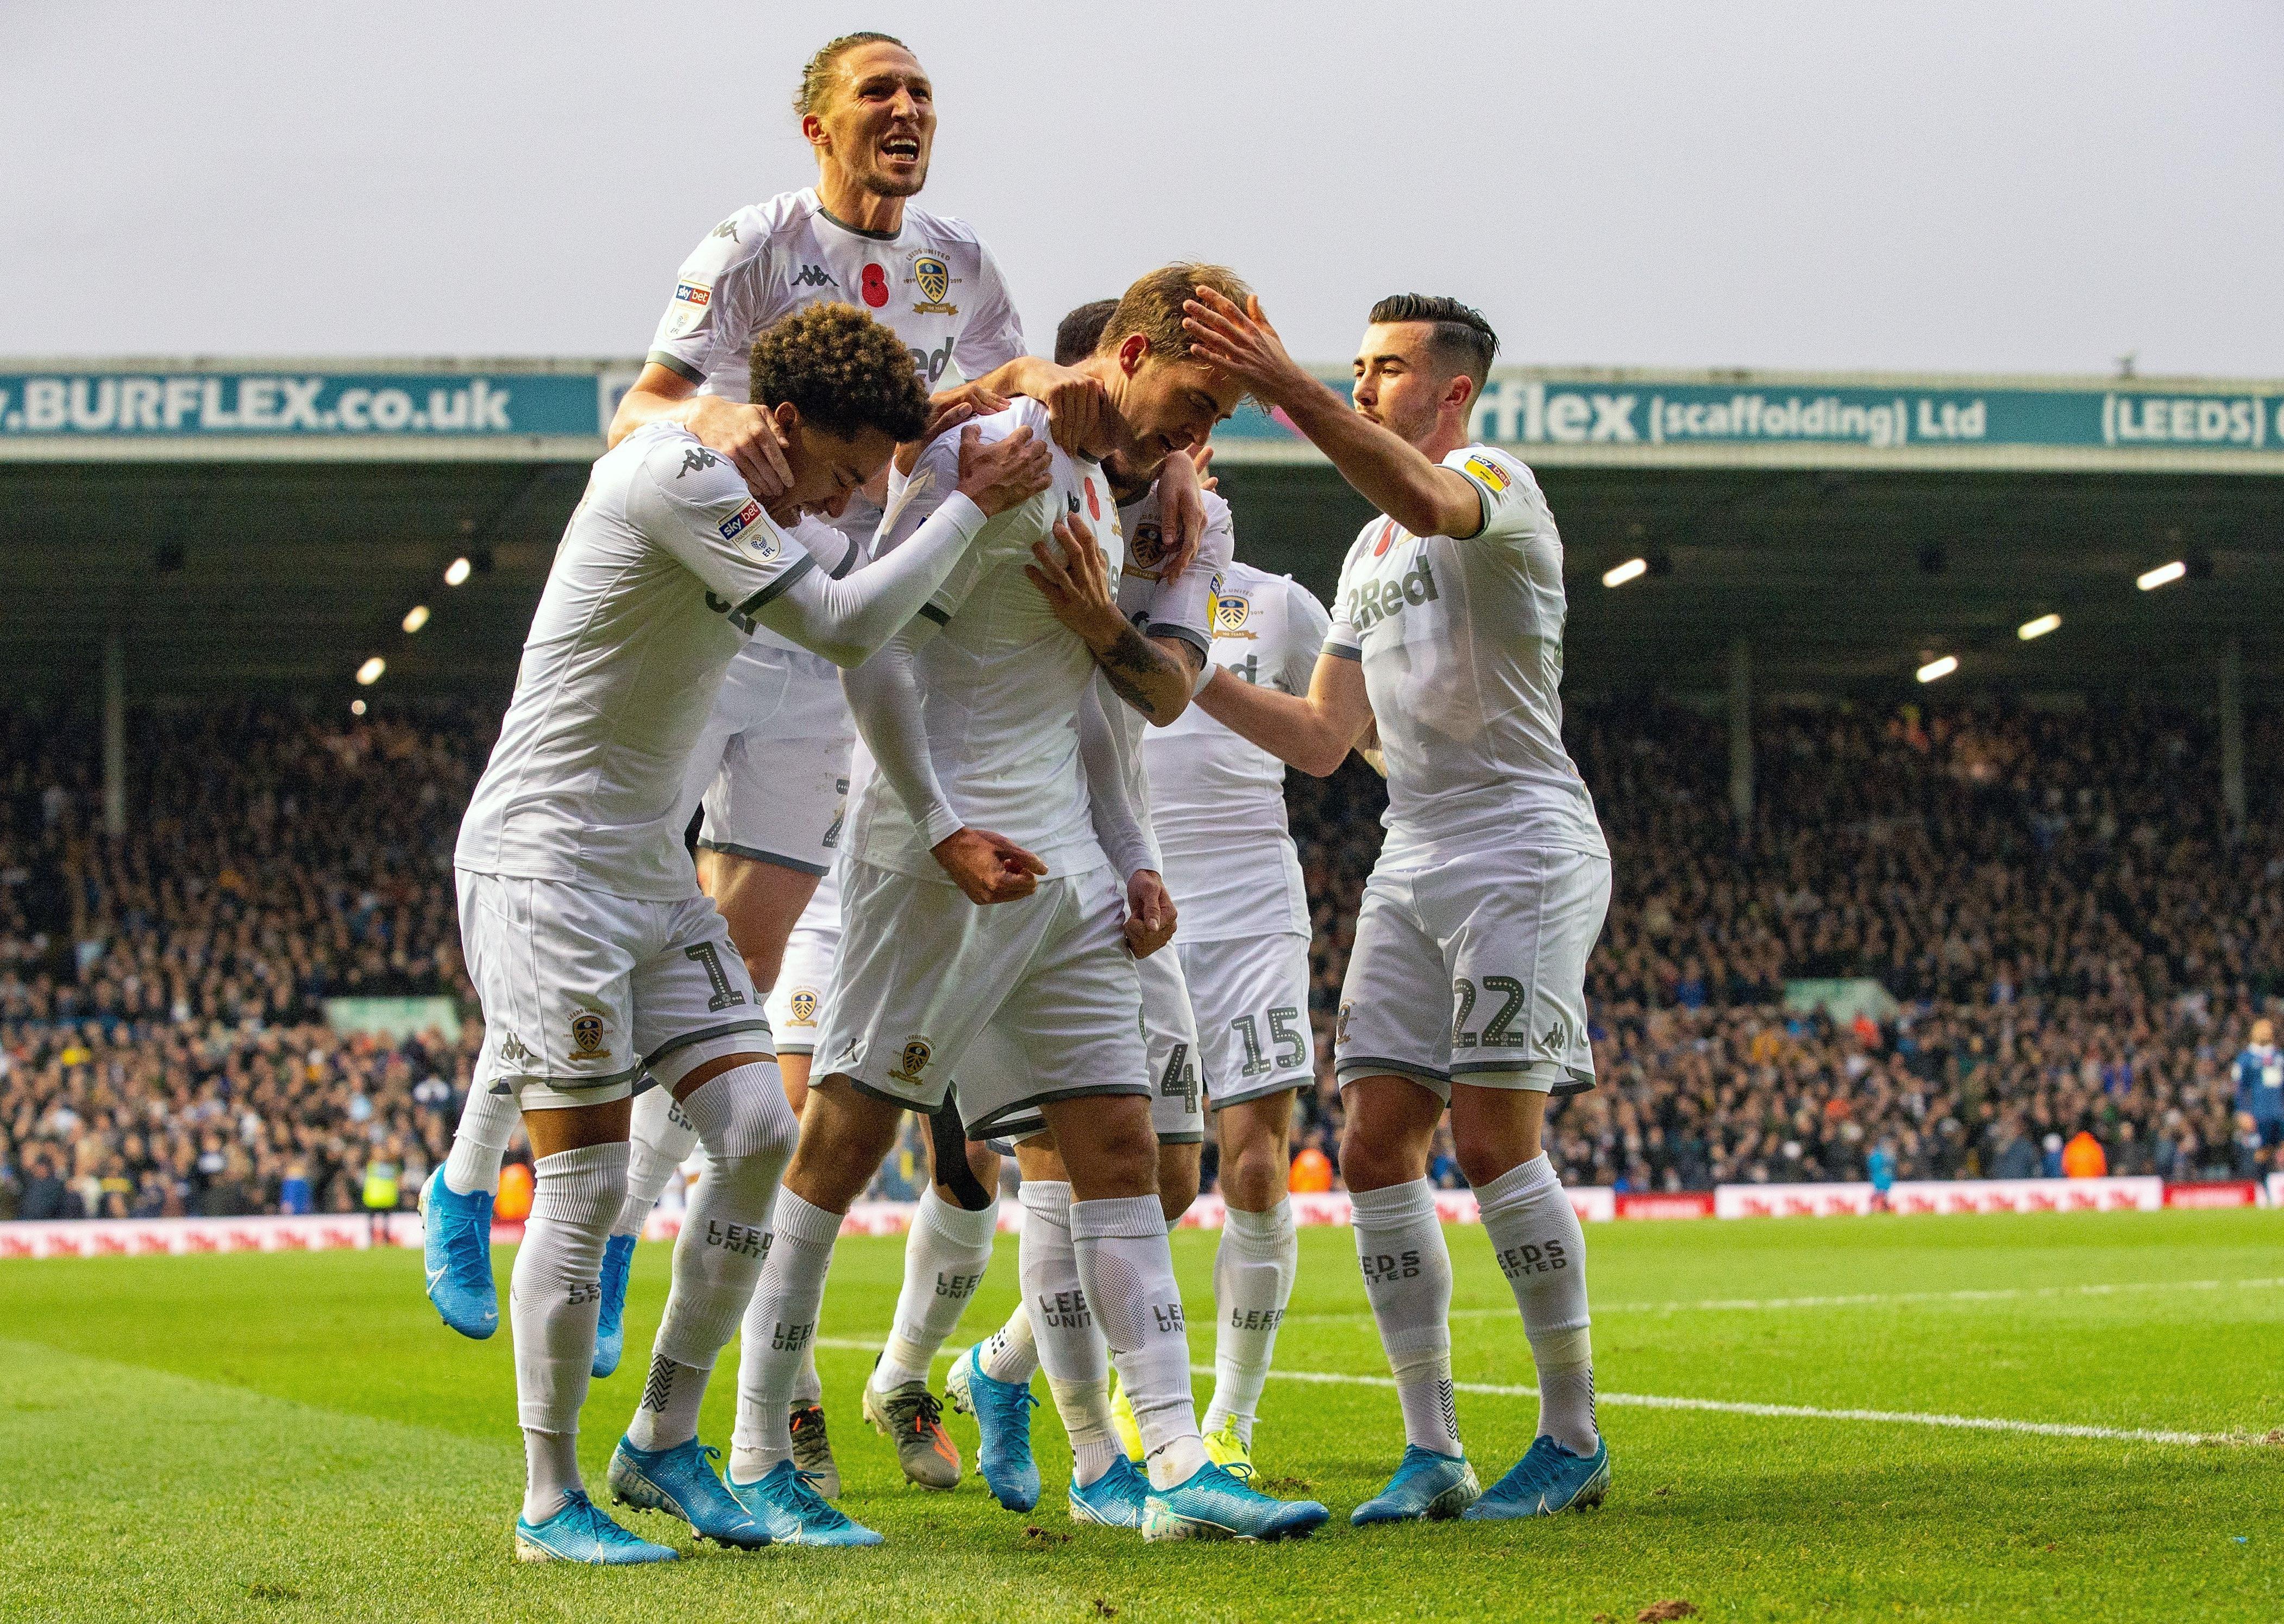 Leeds United should be in Premier League if Coronavirus ends season    Yorkshire Post